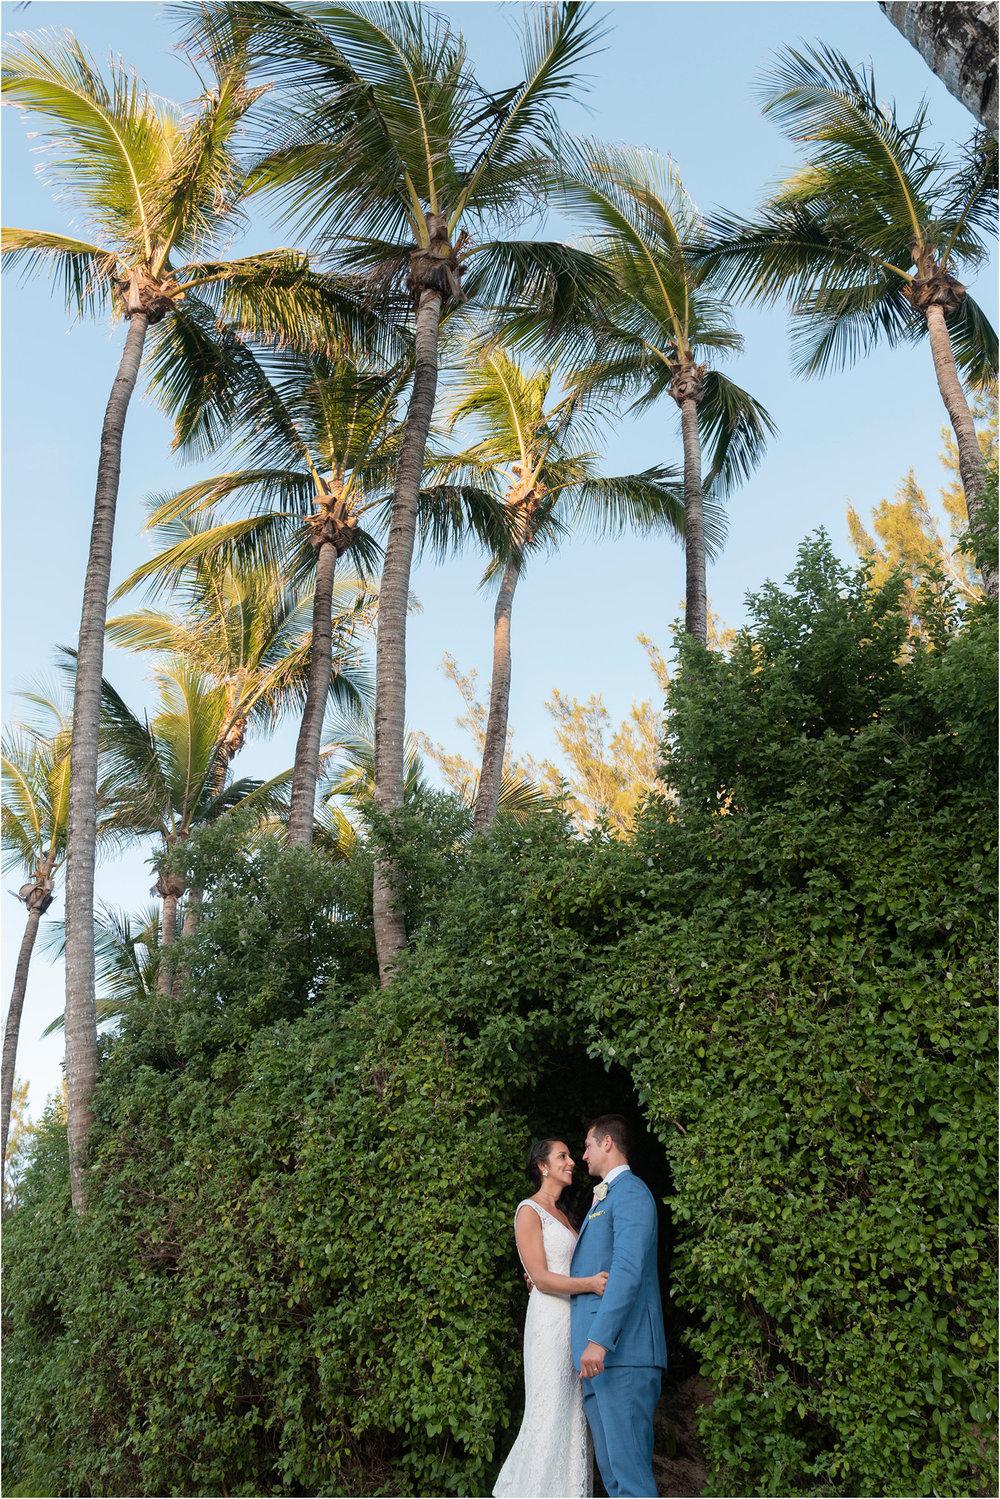 ©FianderFoto_Bermuda Wedding Photographer_Fairmont Southampton_Wedding_Anna_Thomas_097.jpg